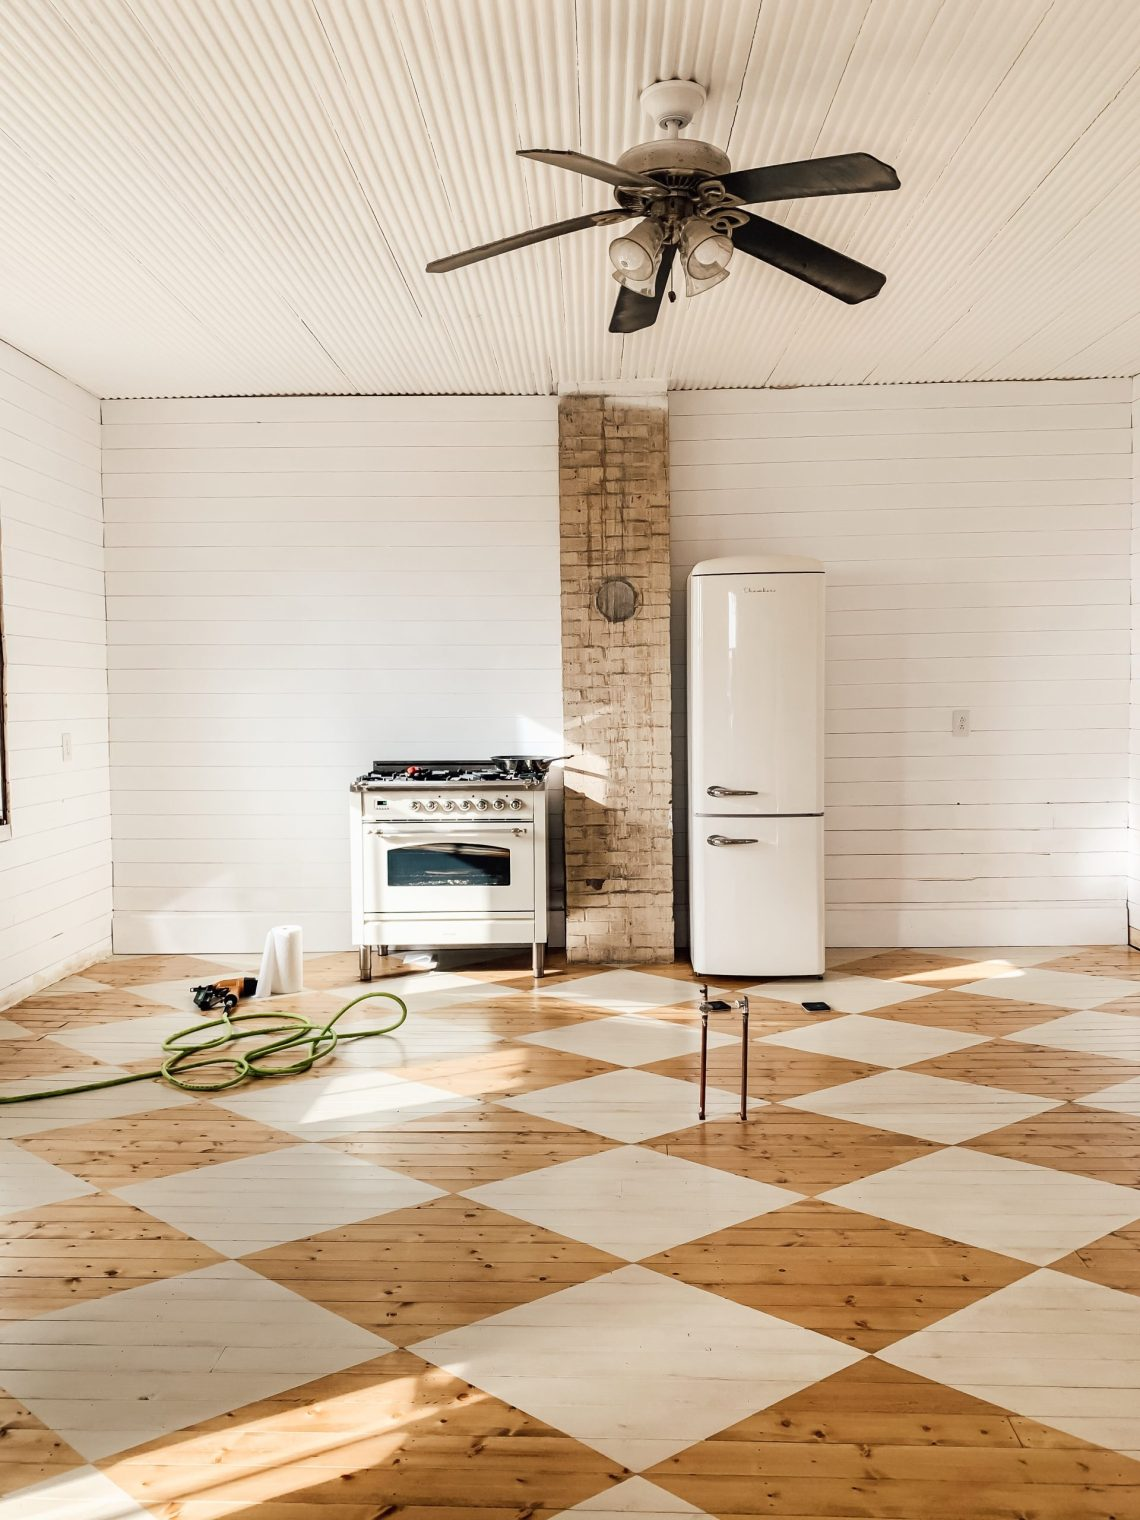 Farmhouse Kitchen Floors and Walls